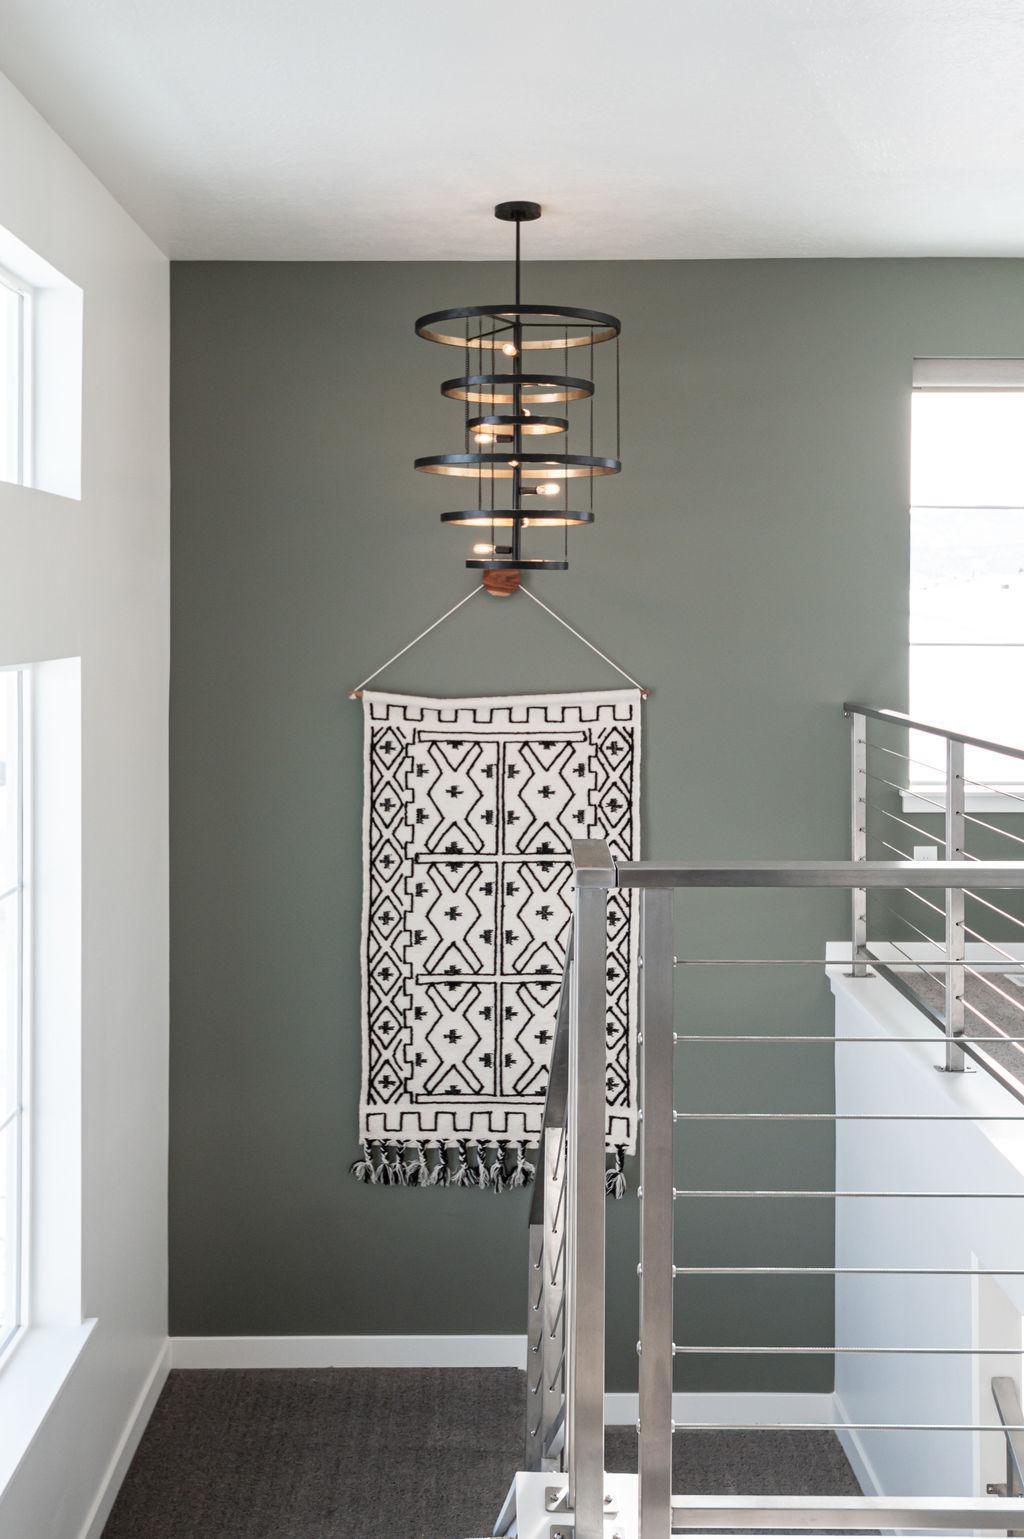 Living Area featured in the Argento By Garbett Homes in Salt Lake City-Ogden, UT